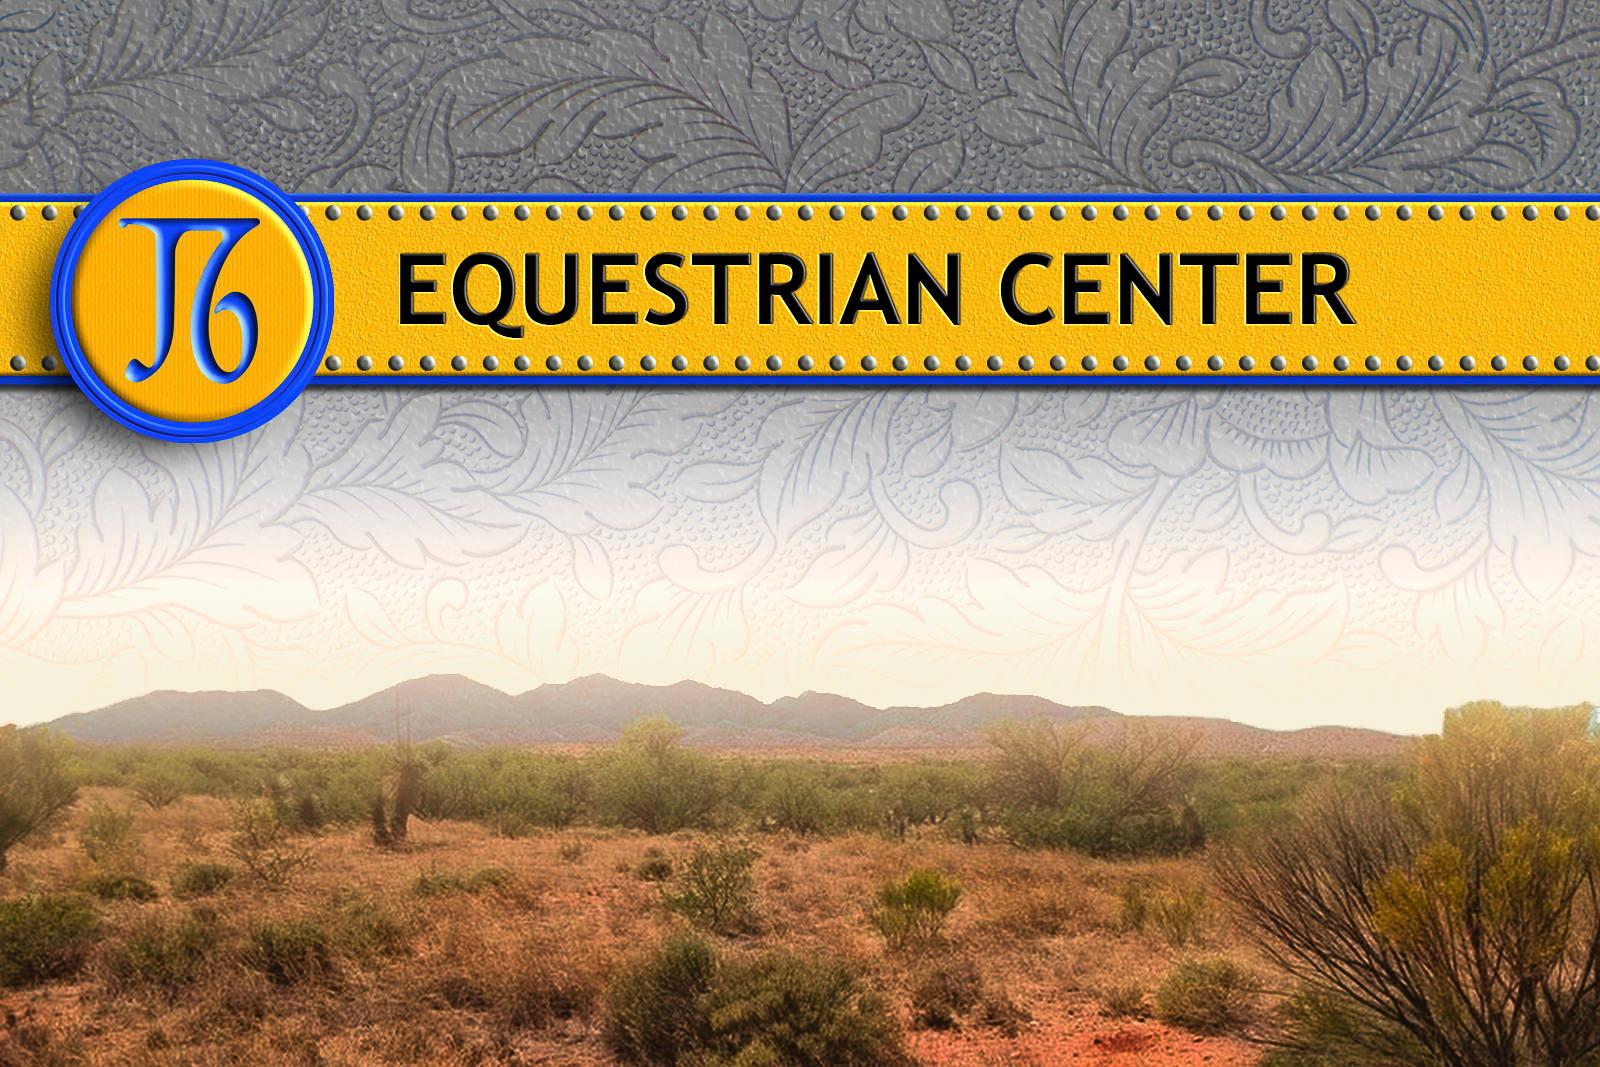 J6 Equestrian Center, Benson Arizona